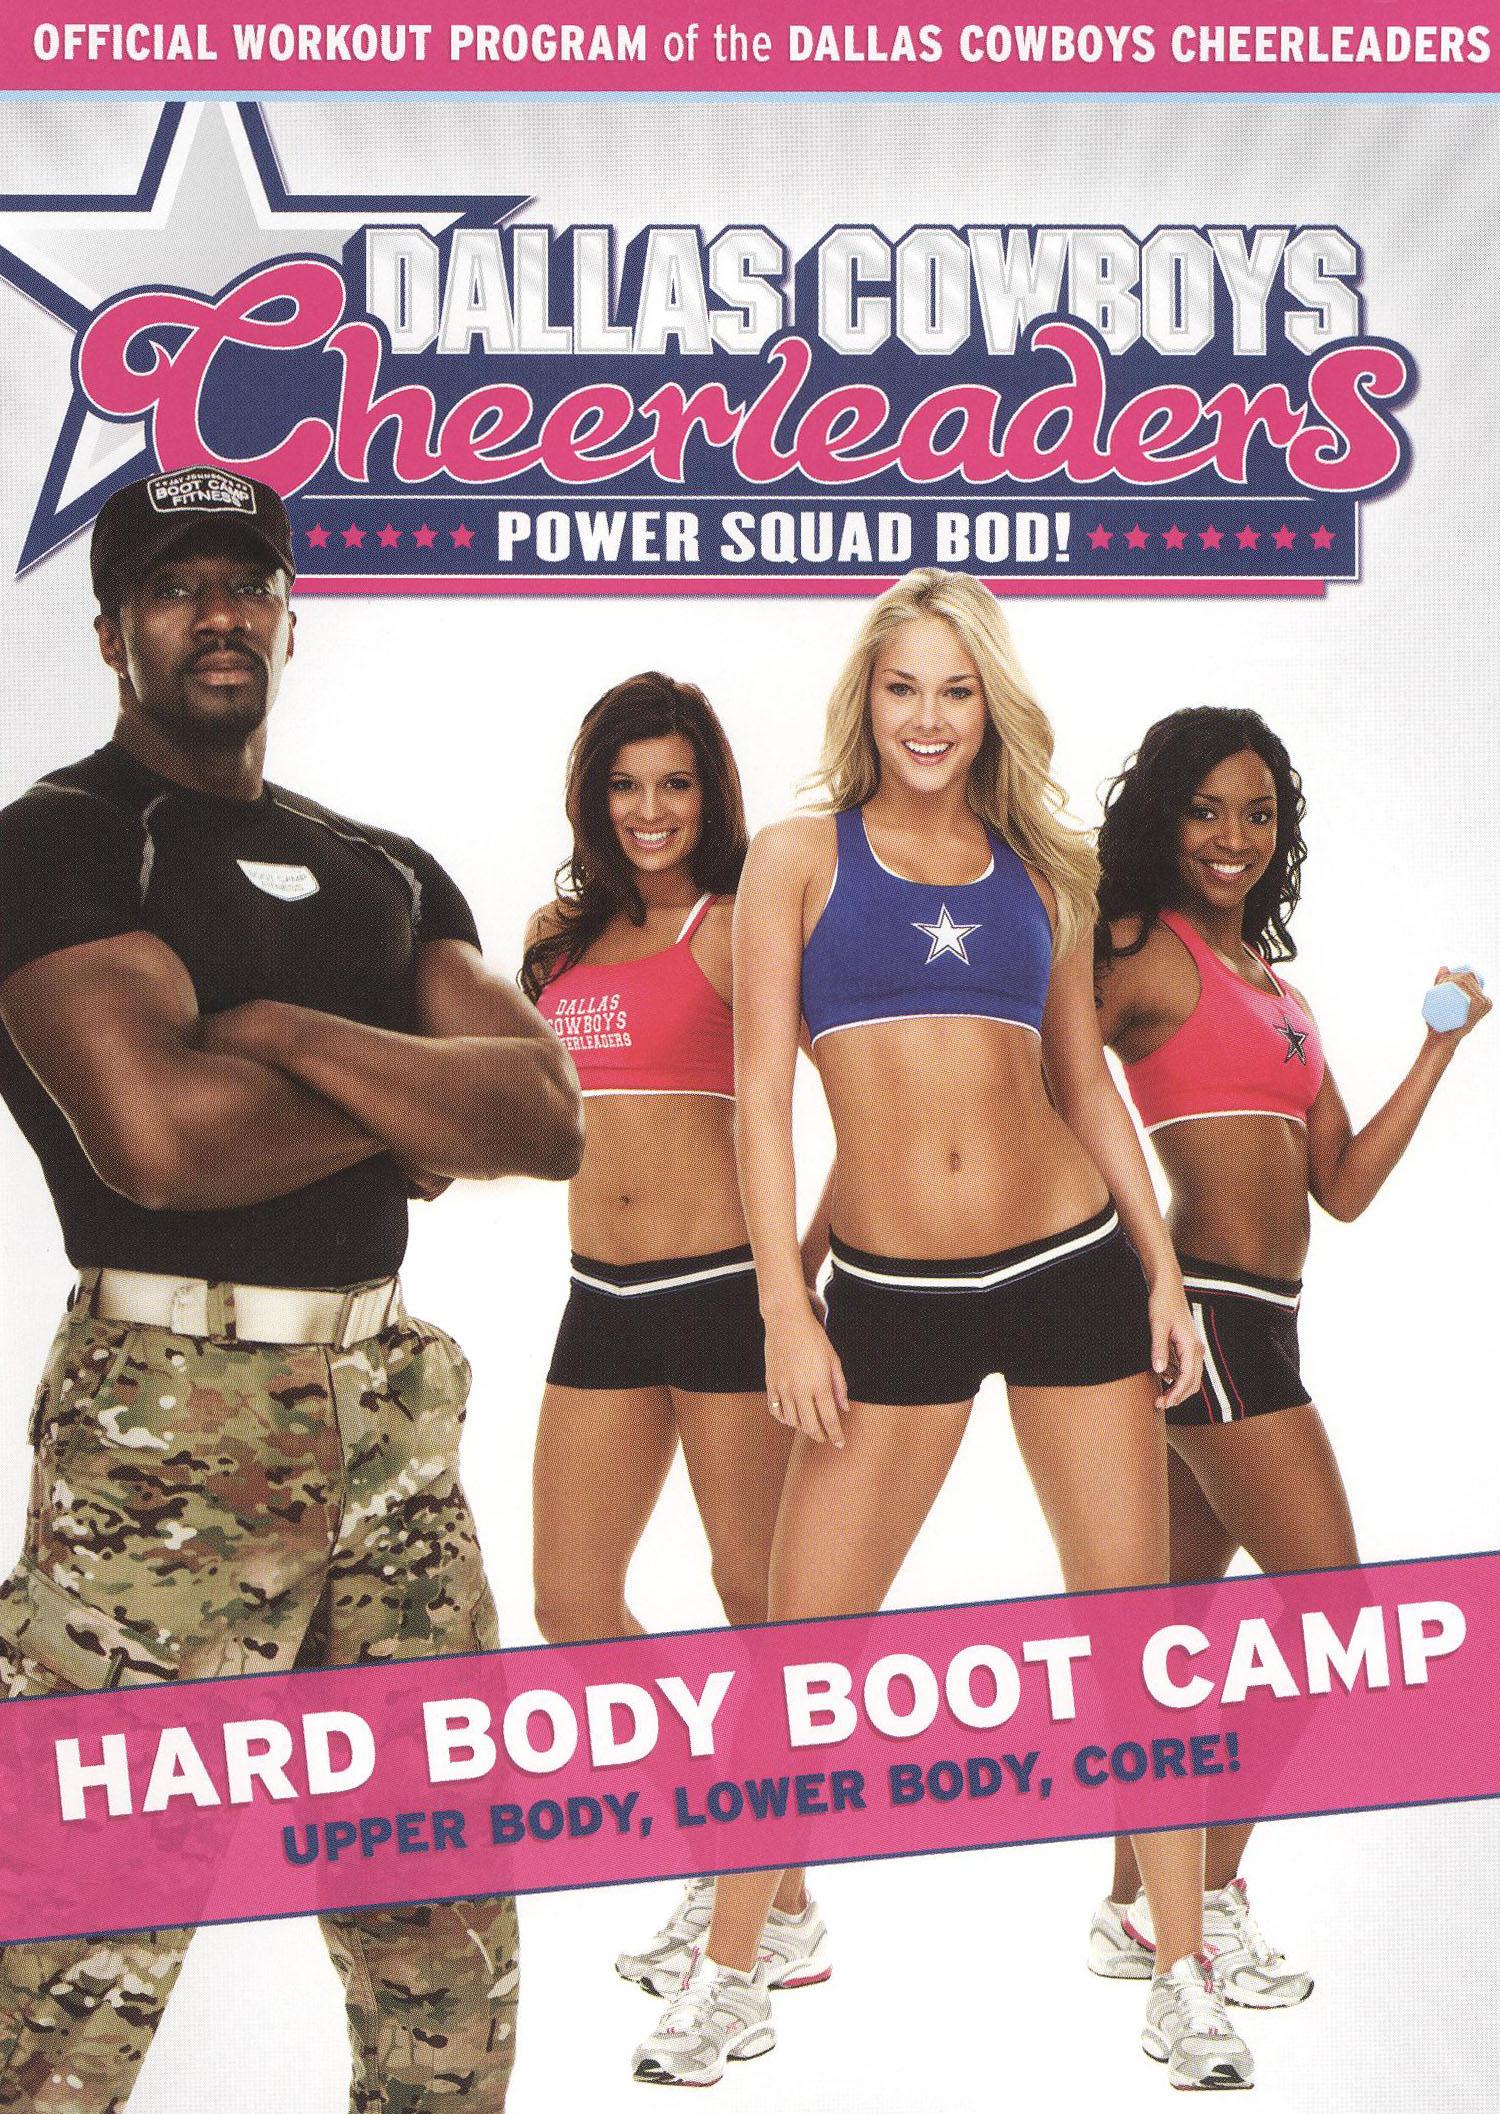 Dallas Cowboys Cheerleaders: Power Squad Bod! - Hard Body Boot Camp (dvd) 9505449